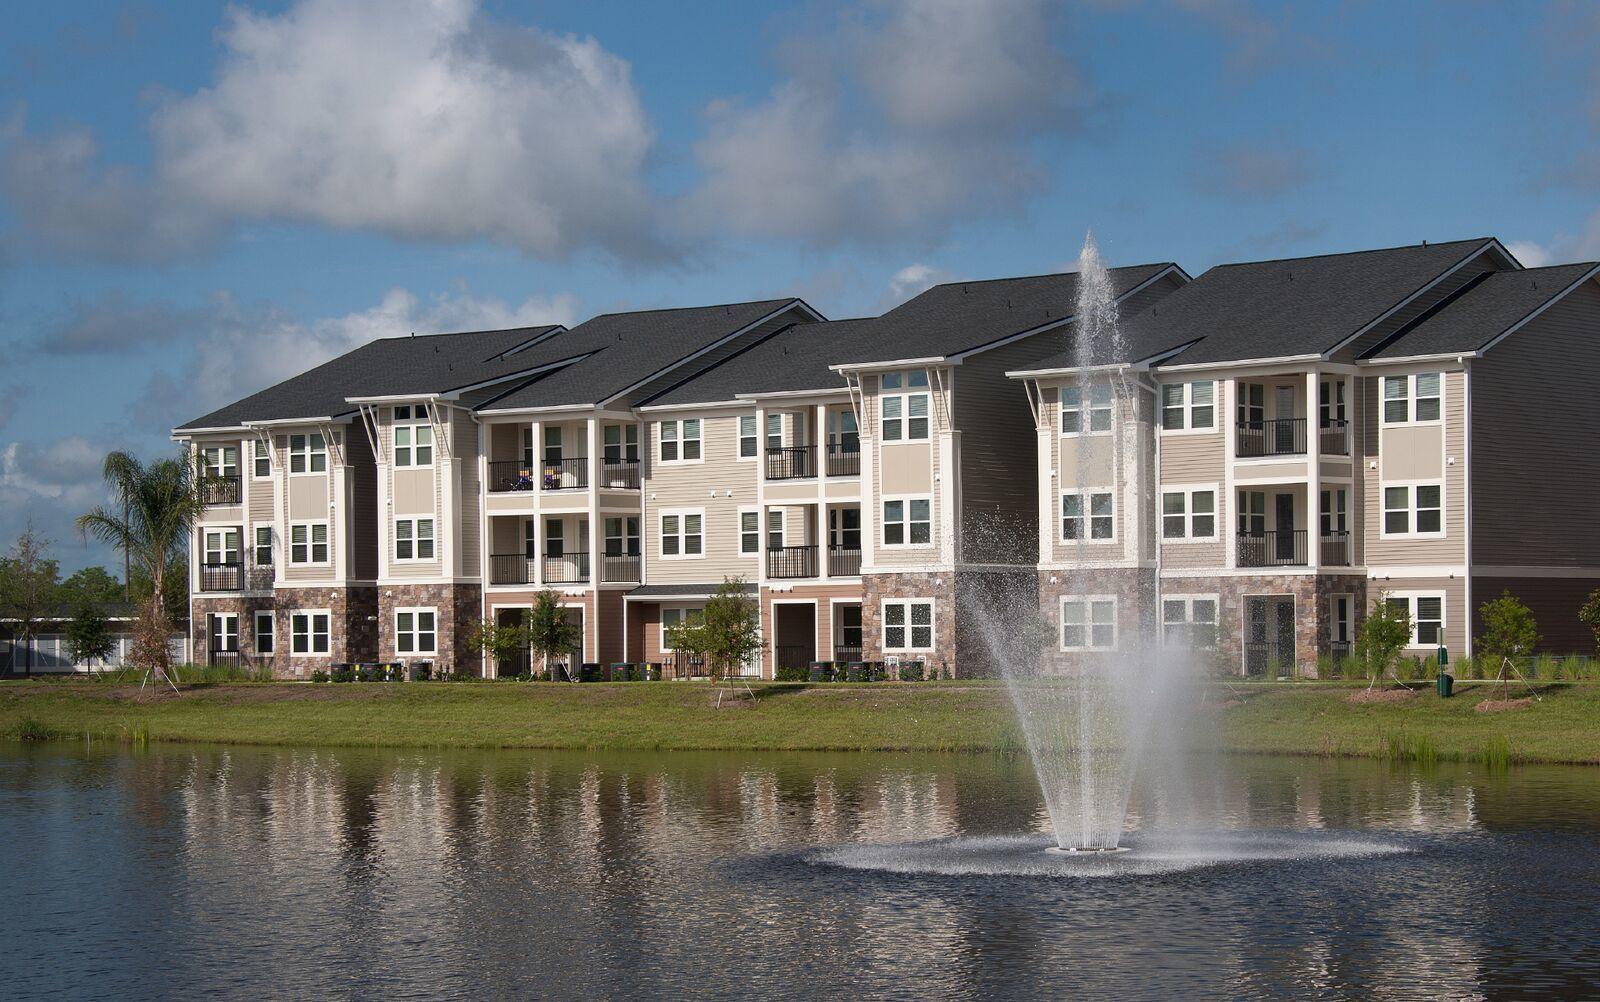 Alugar apartamento nos estados unidos